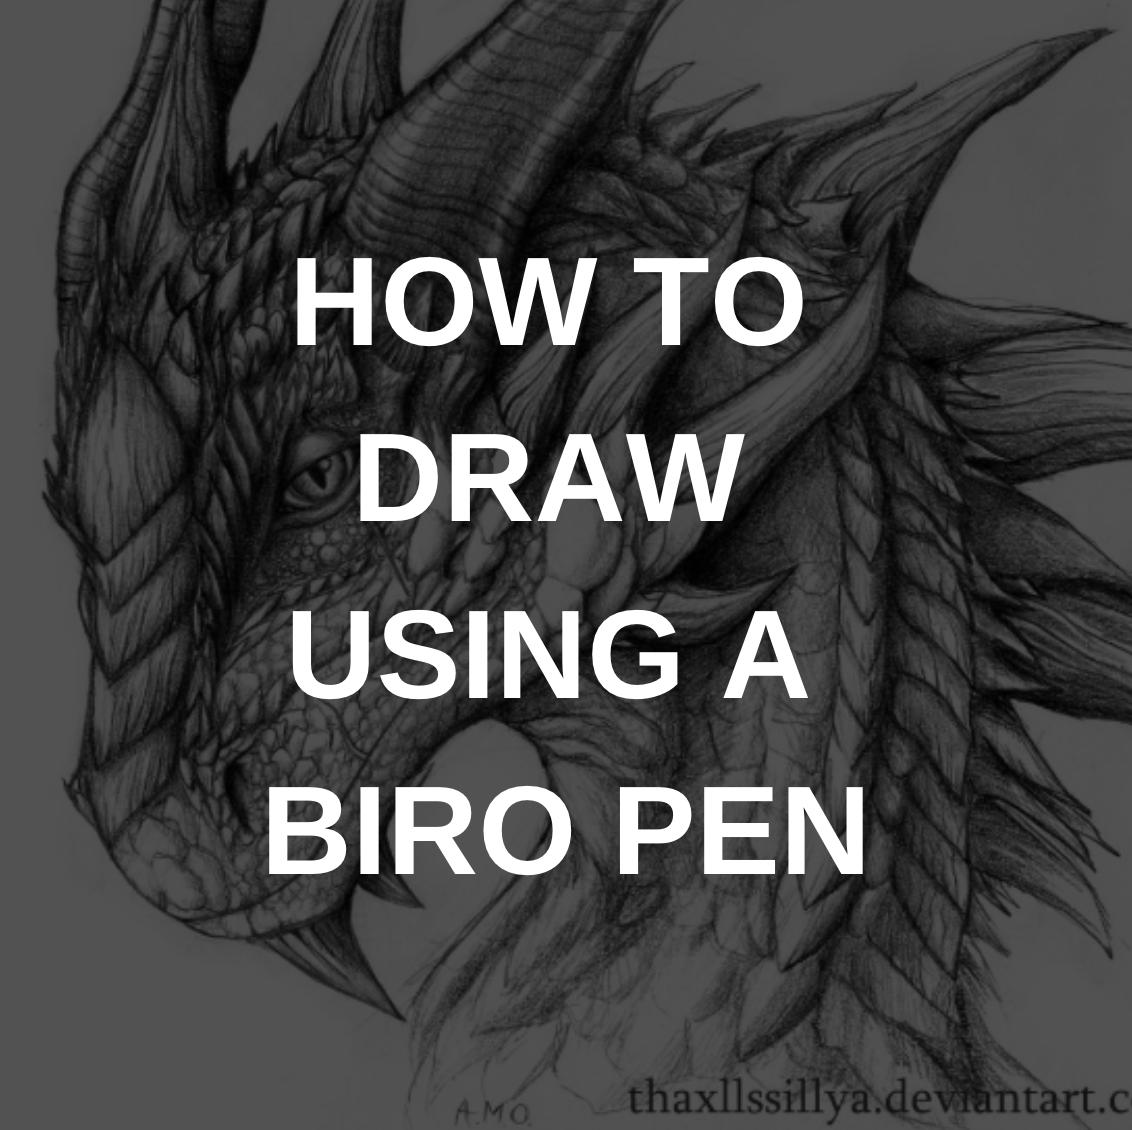 How to Draw Using a Biro Pen? - Artist Hue